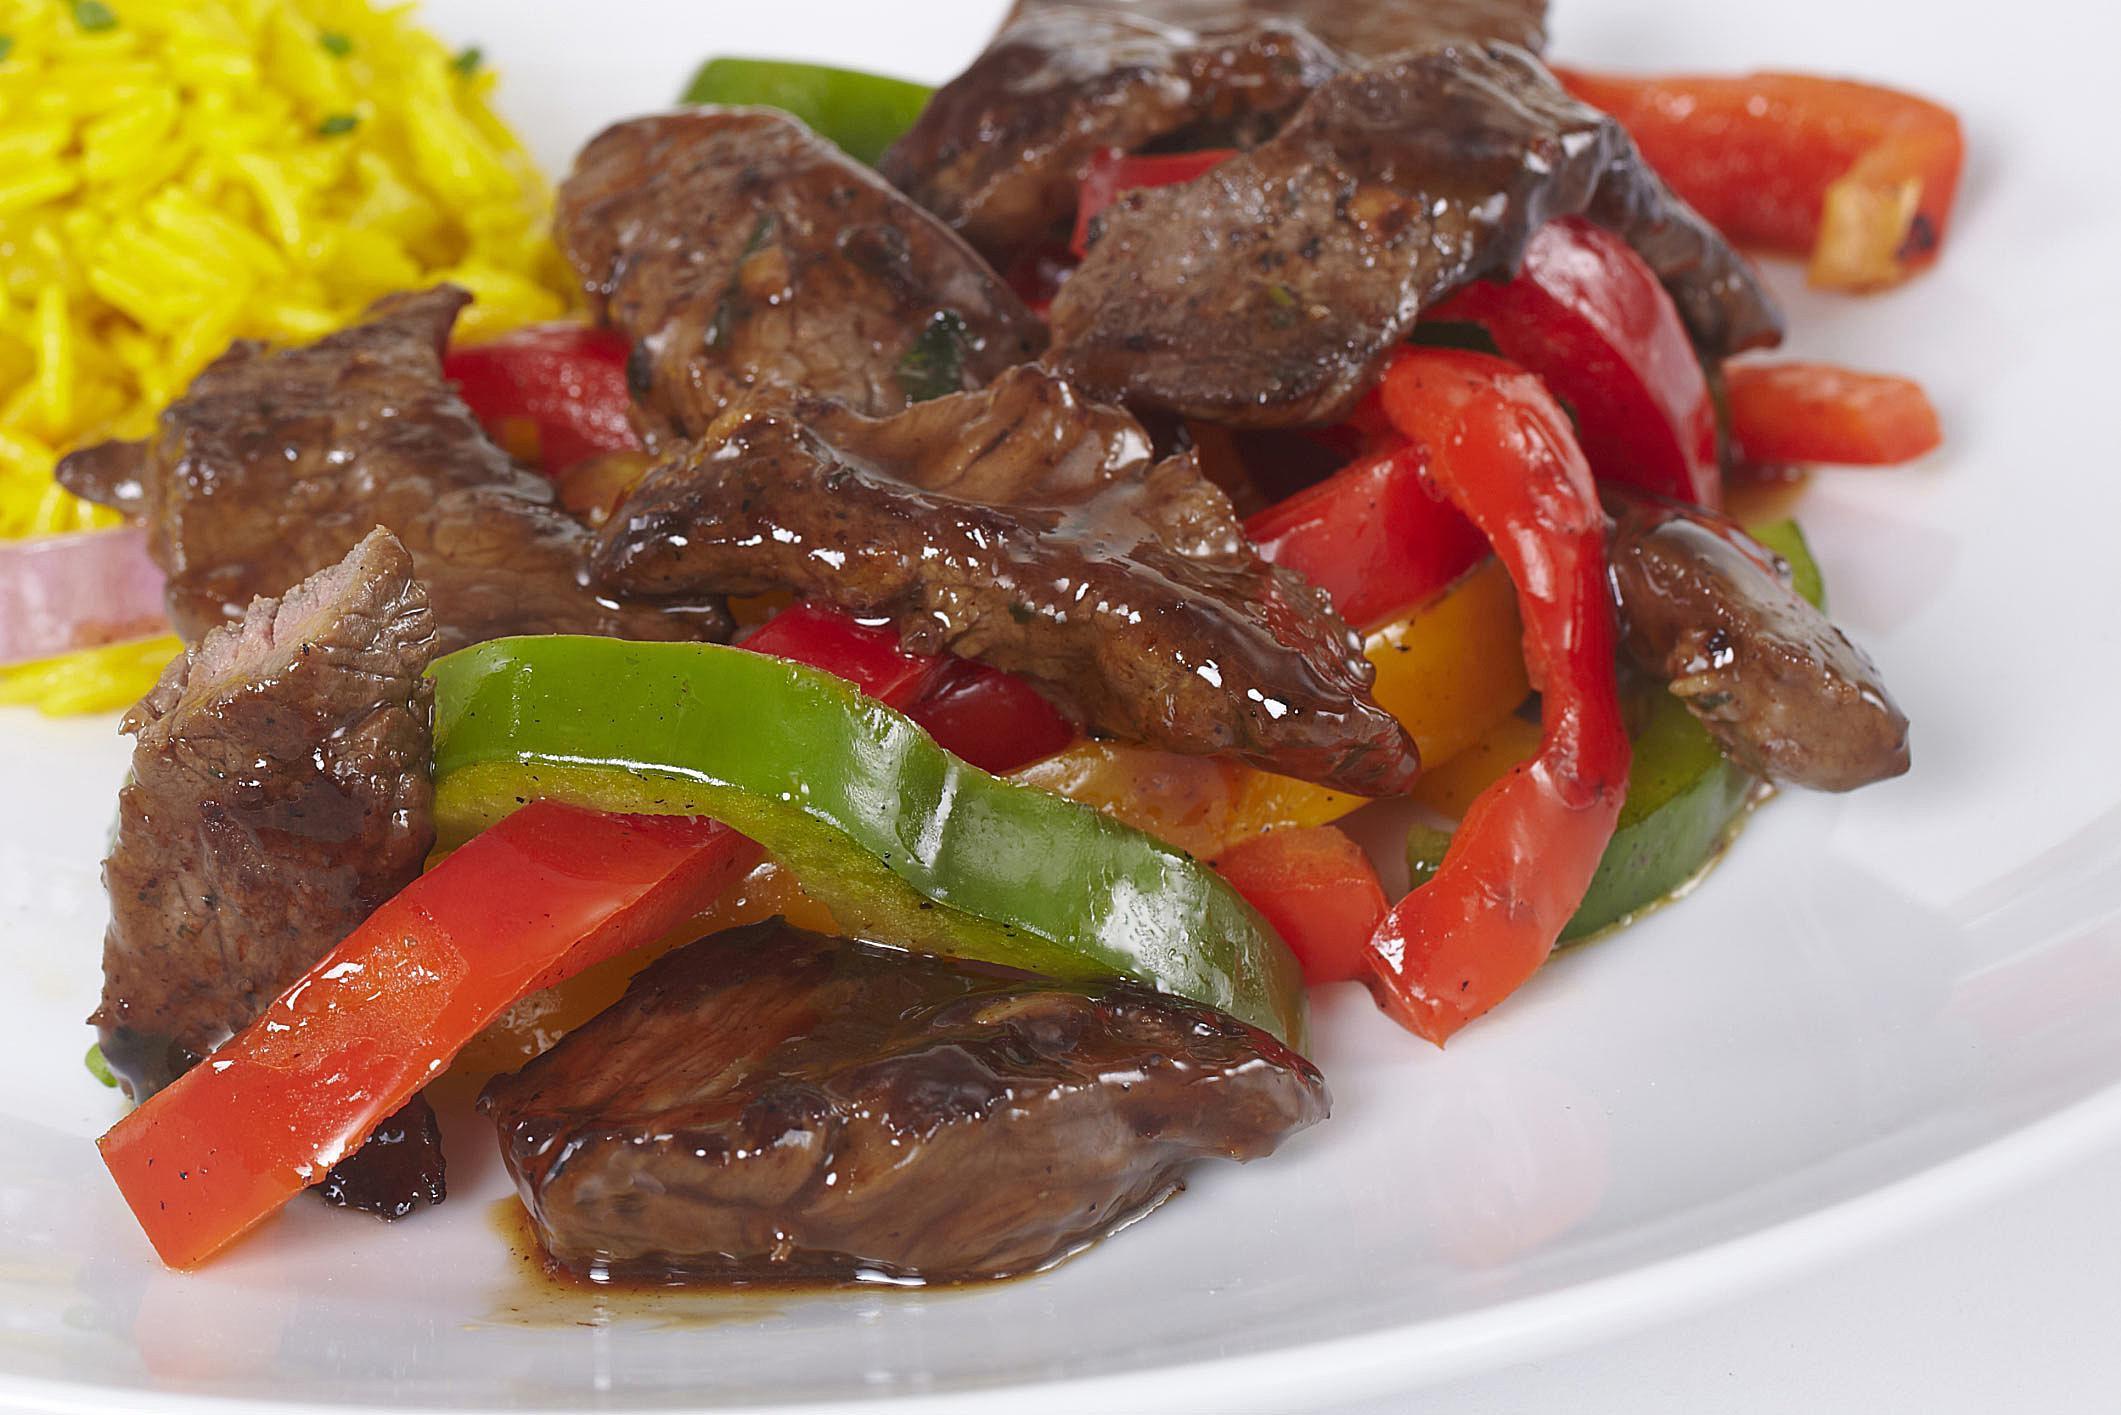 Pepper Steak Recipe With Sirloin Tips